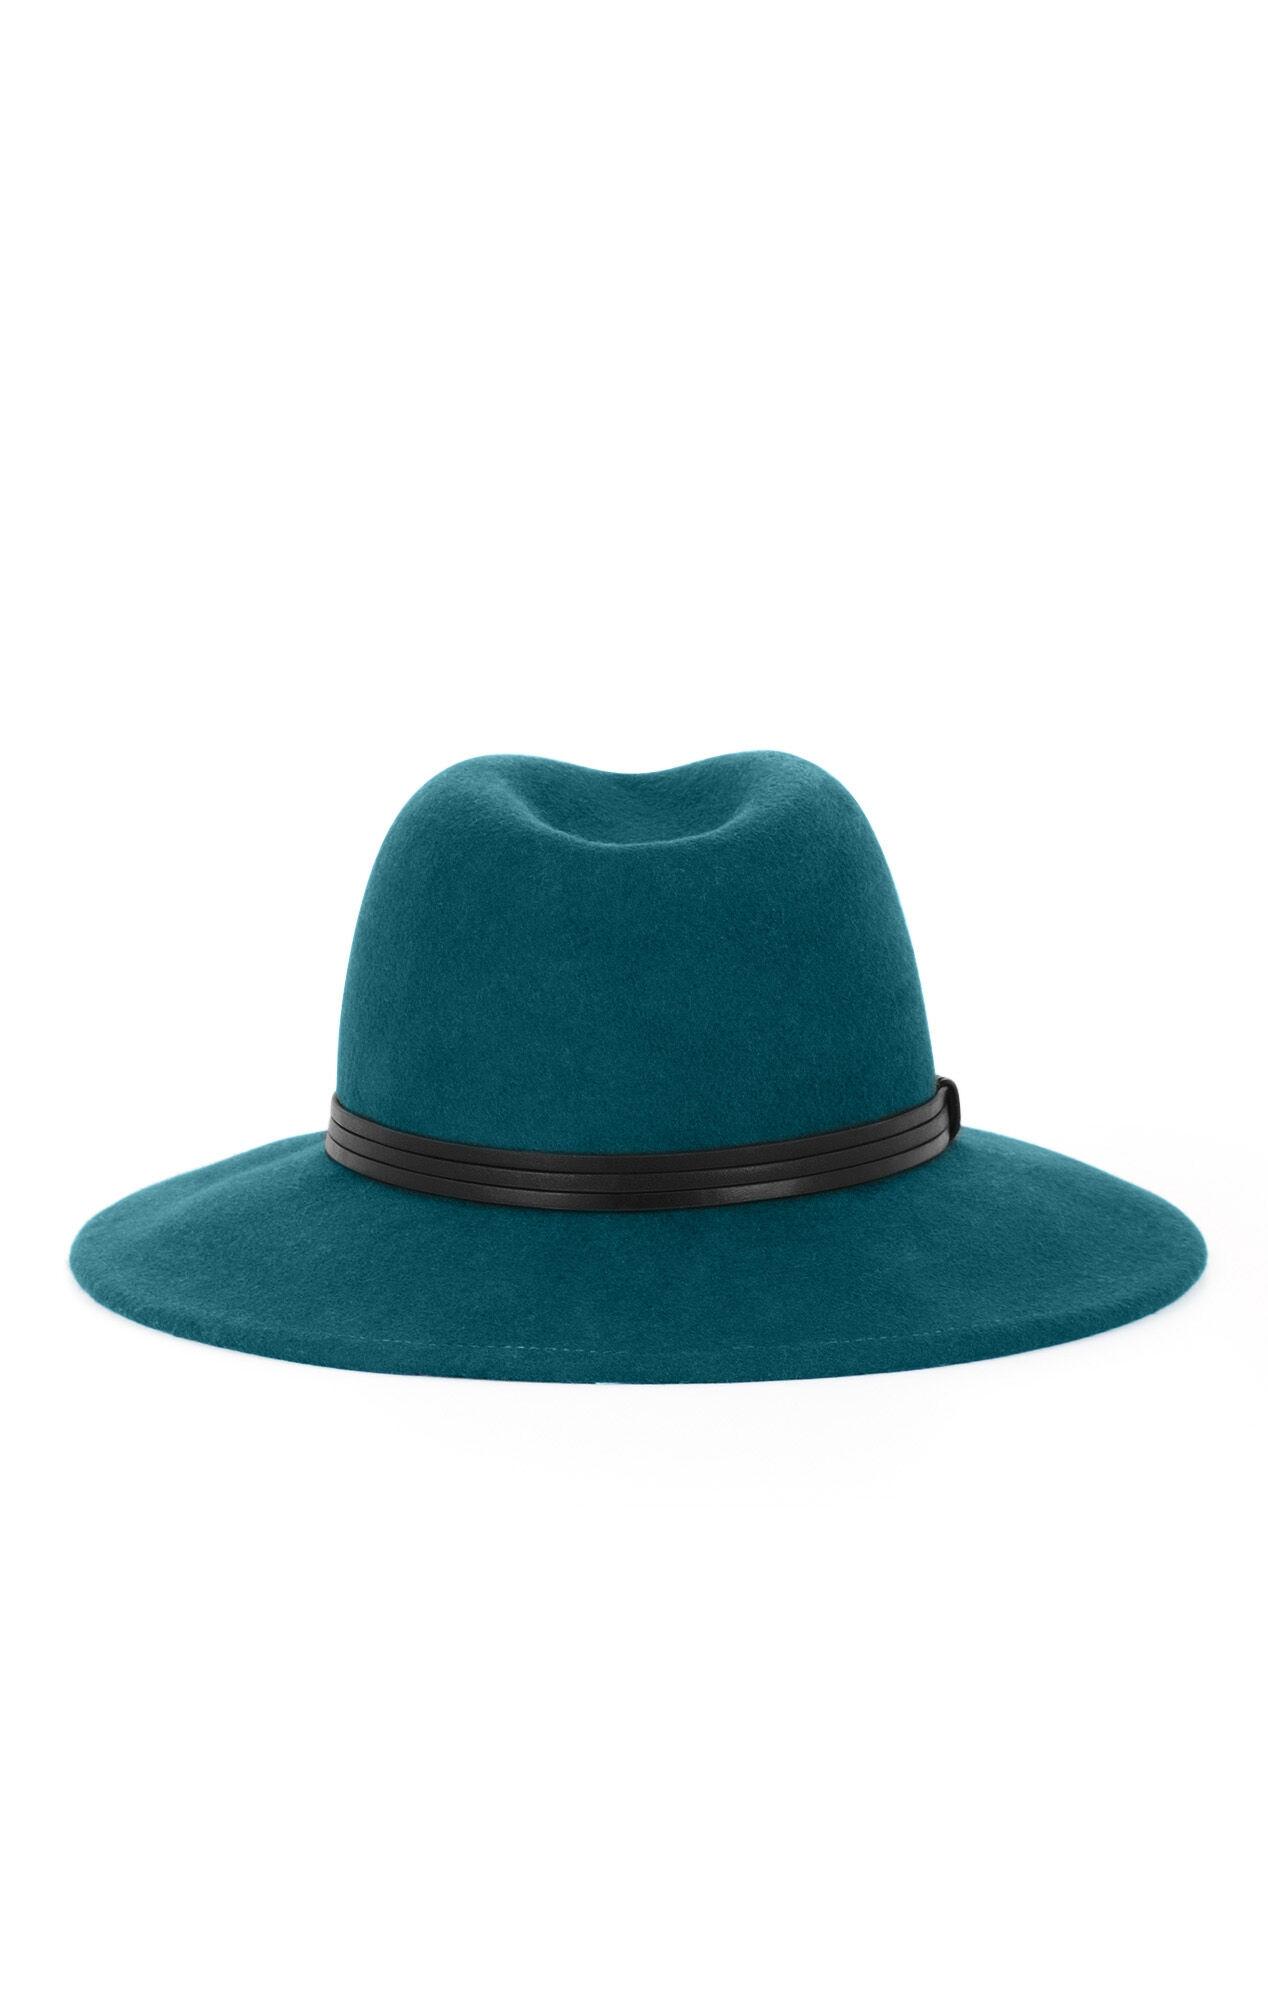 Banded Panama Hat